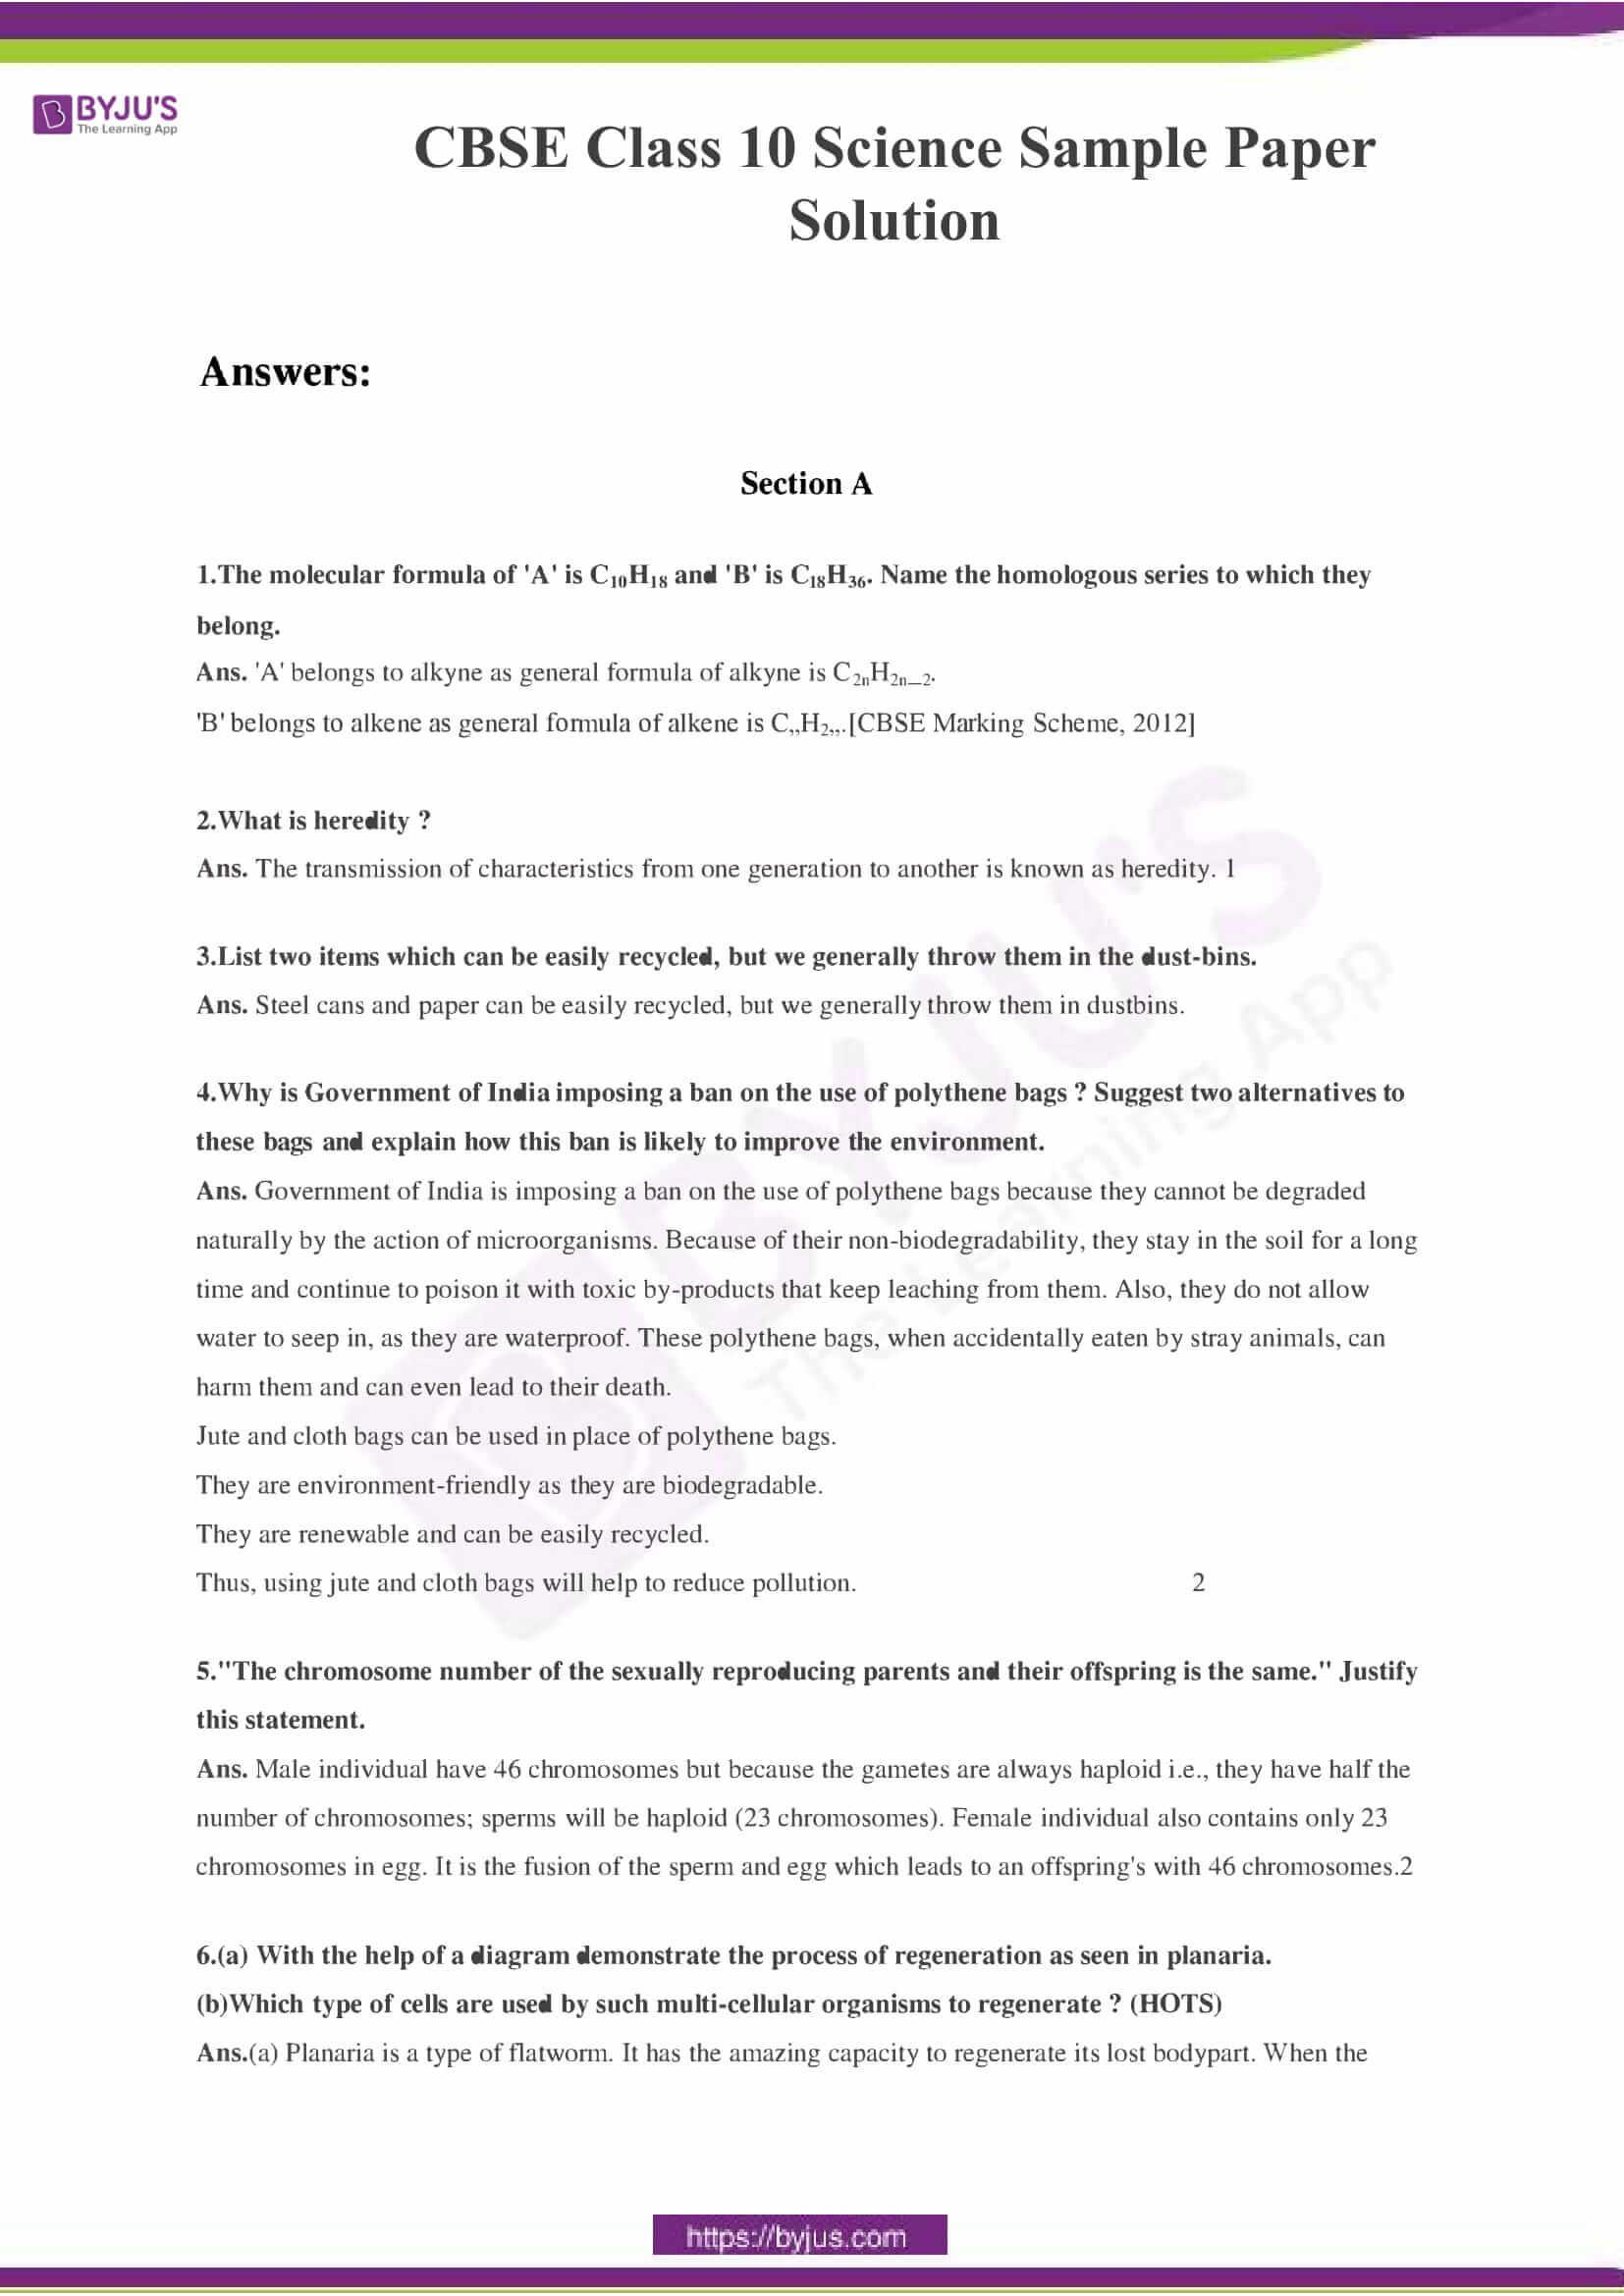 CBSE Class 10 Science Sample Paper Solution Set 3-01